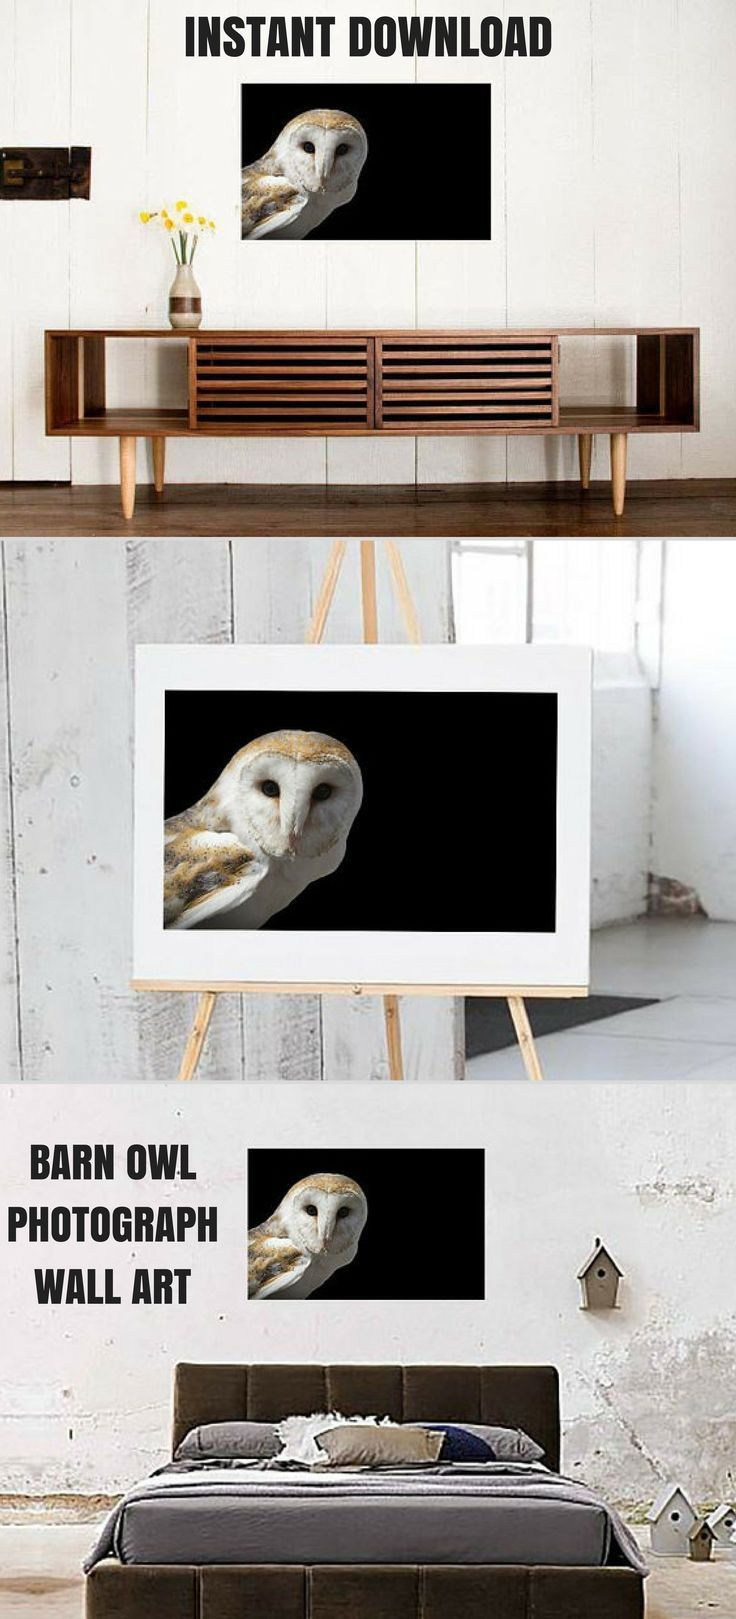 Owl Photograph Wall Art, Owl Print, Barn Owl, Wildlife Decor, Owl Decor, Bird, Outdoor Wildlife Nature Photo, Instant Download Printable